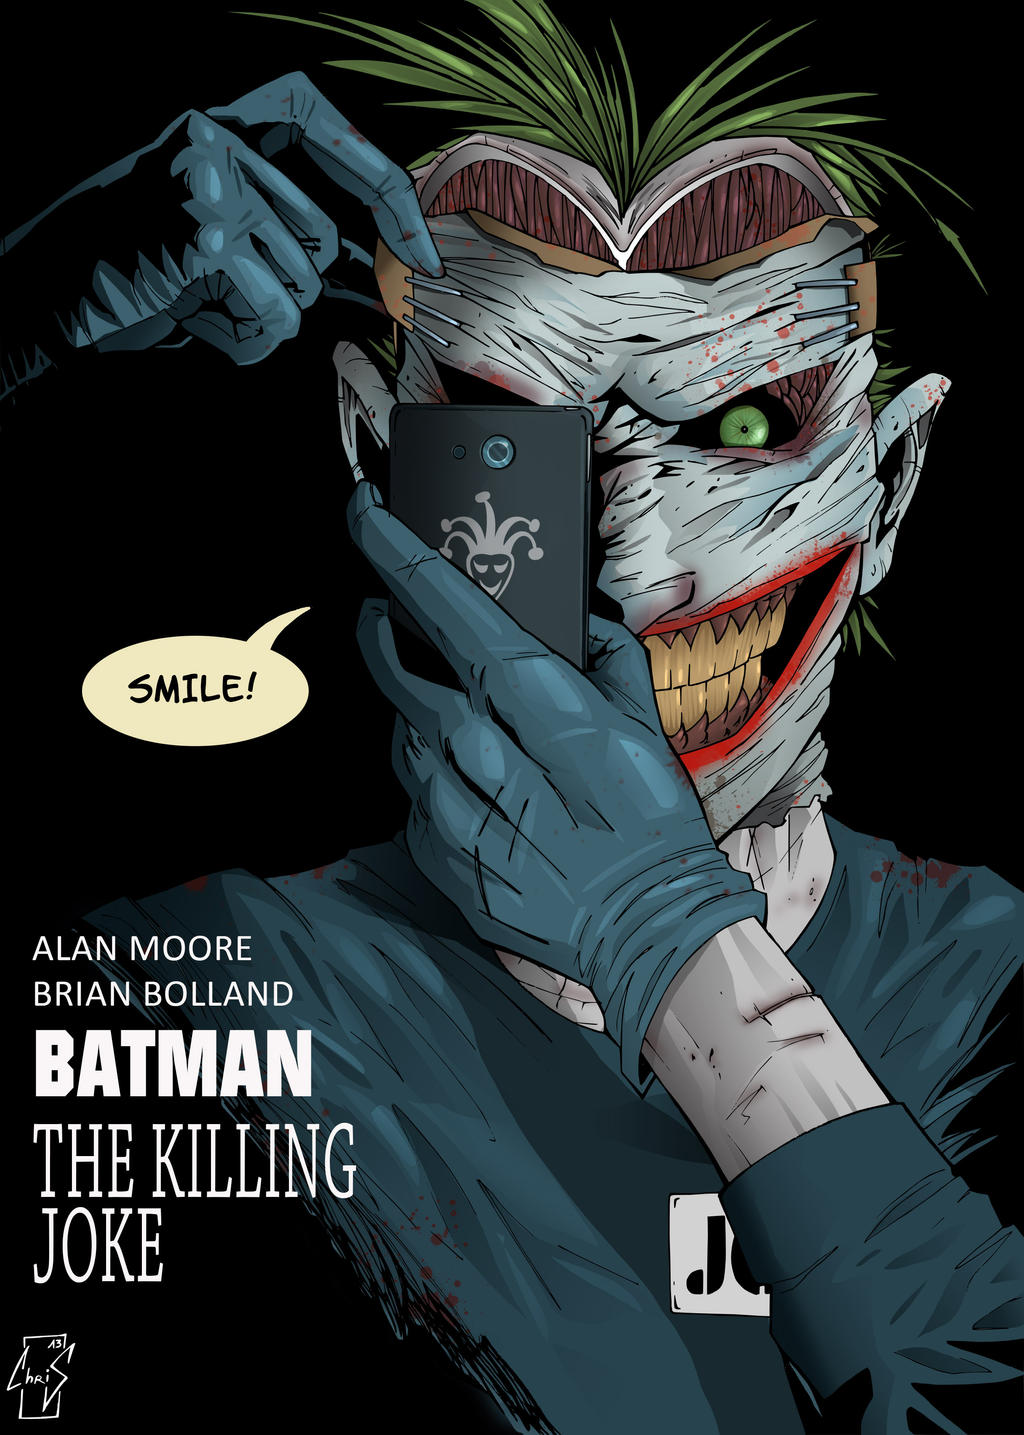 The Killing Joke new 52 by Spidertof